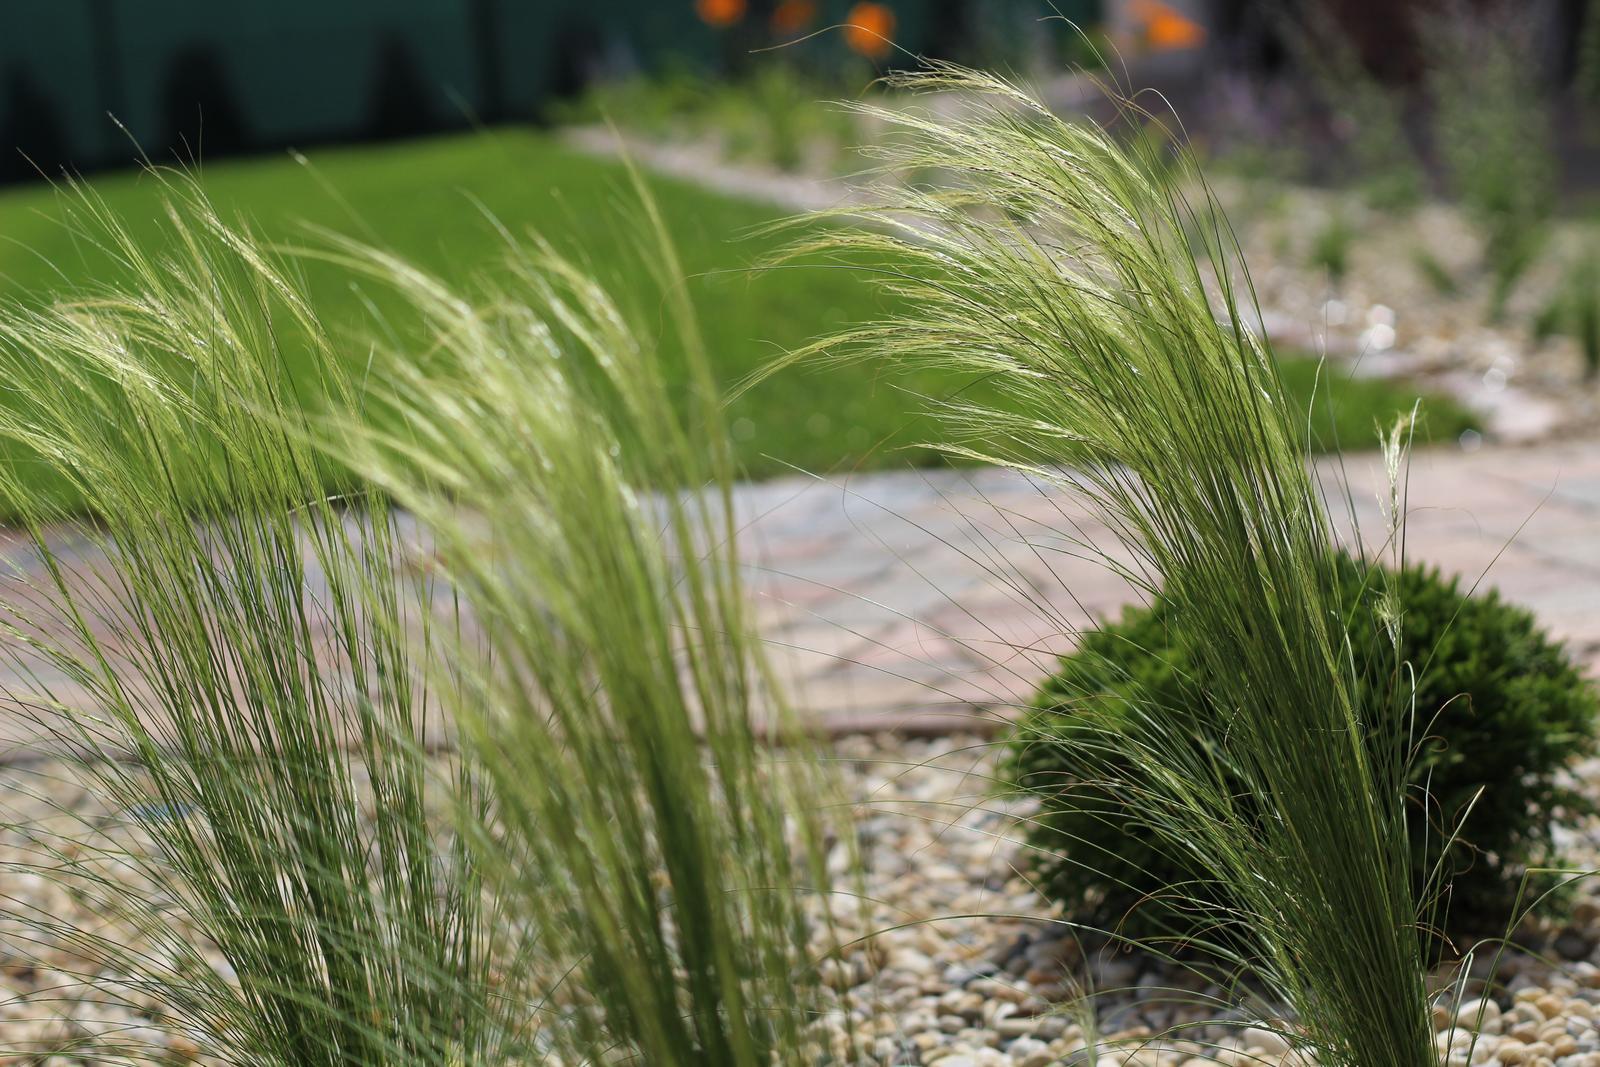 Exteriér - záhrada - Obrázok č. 58